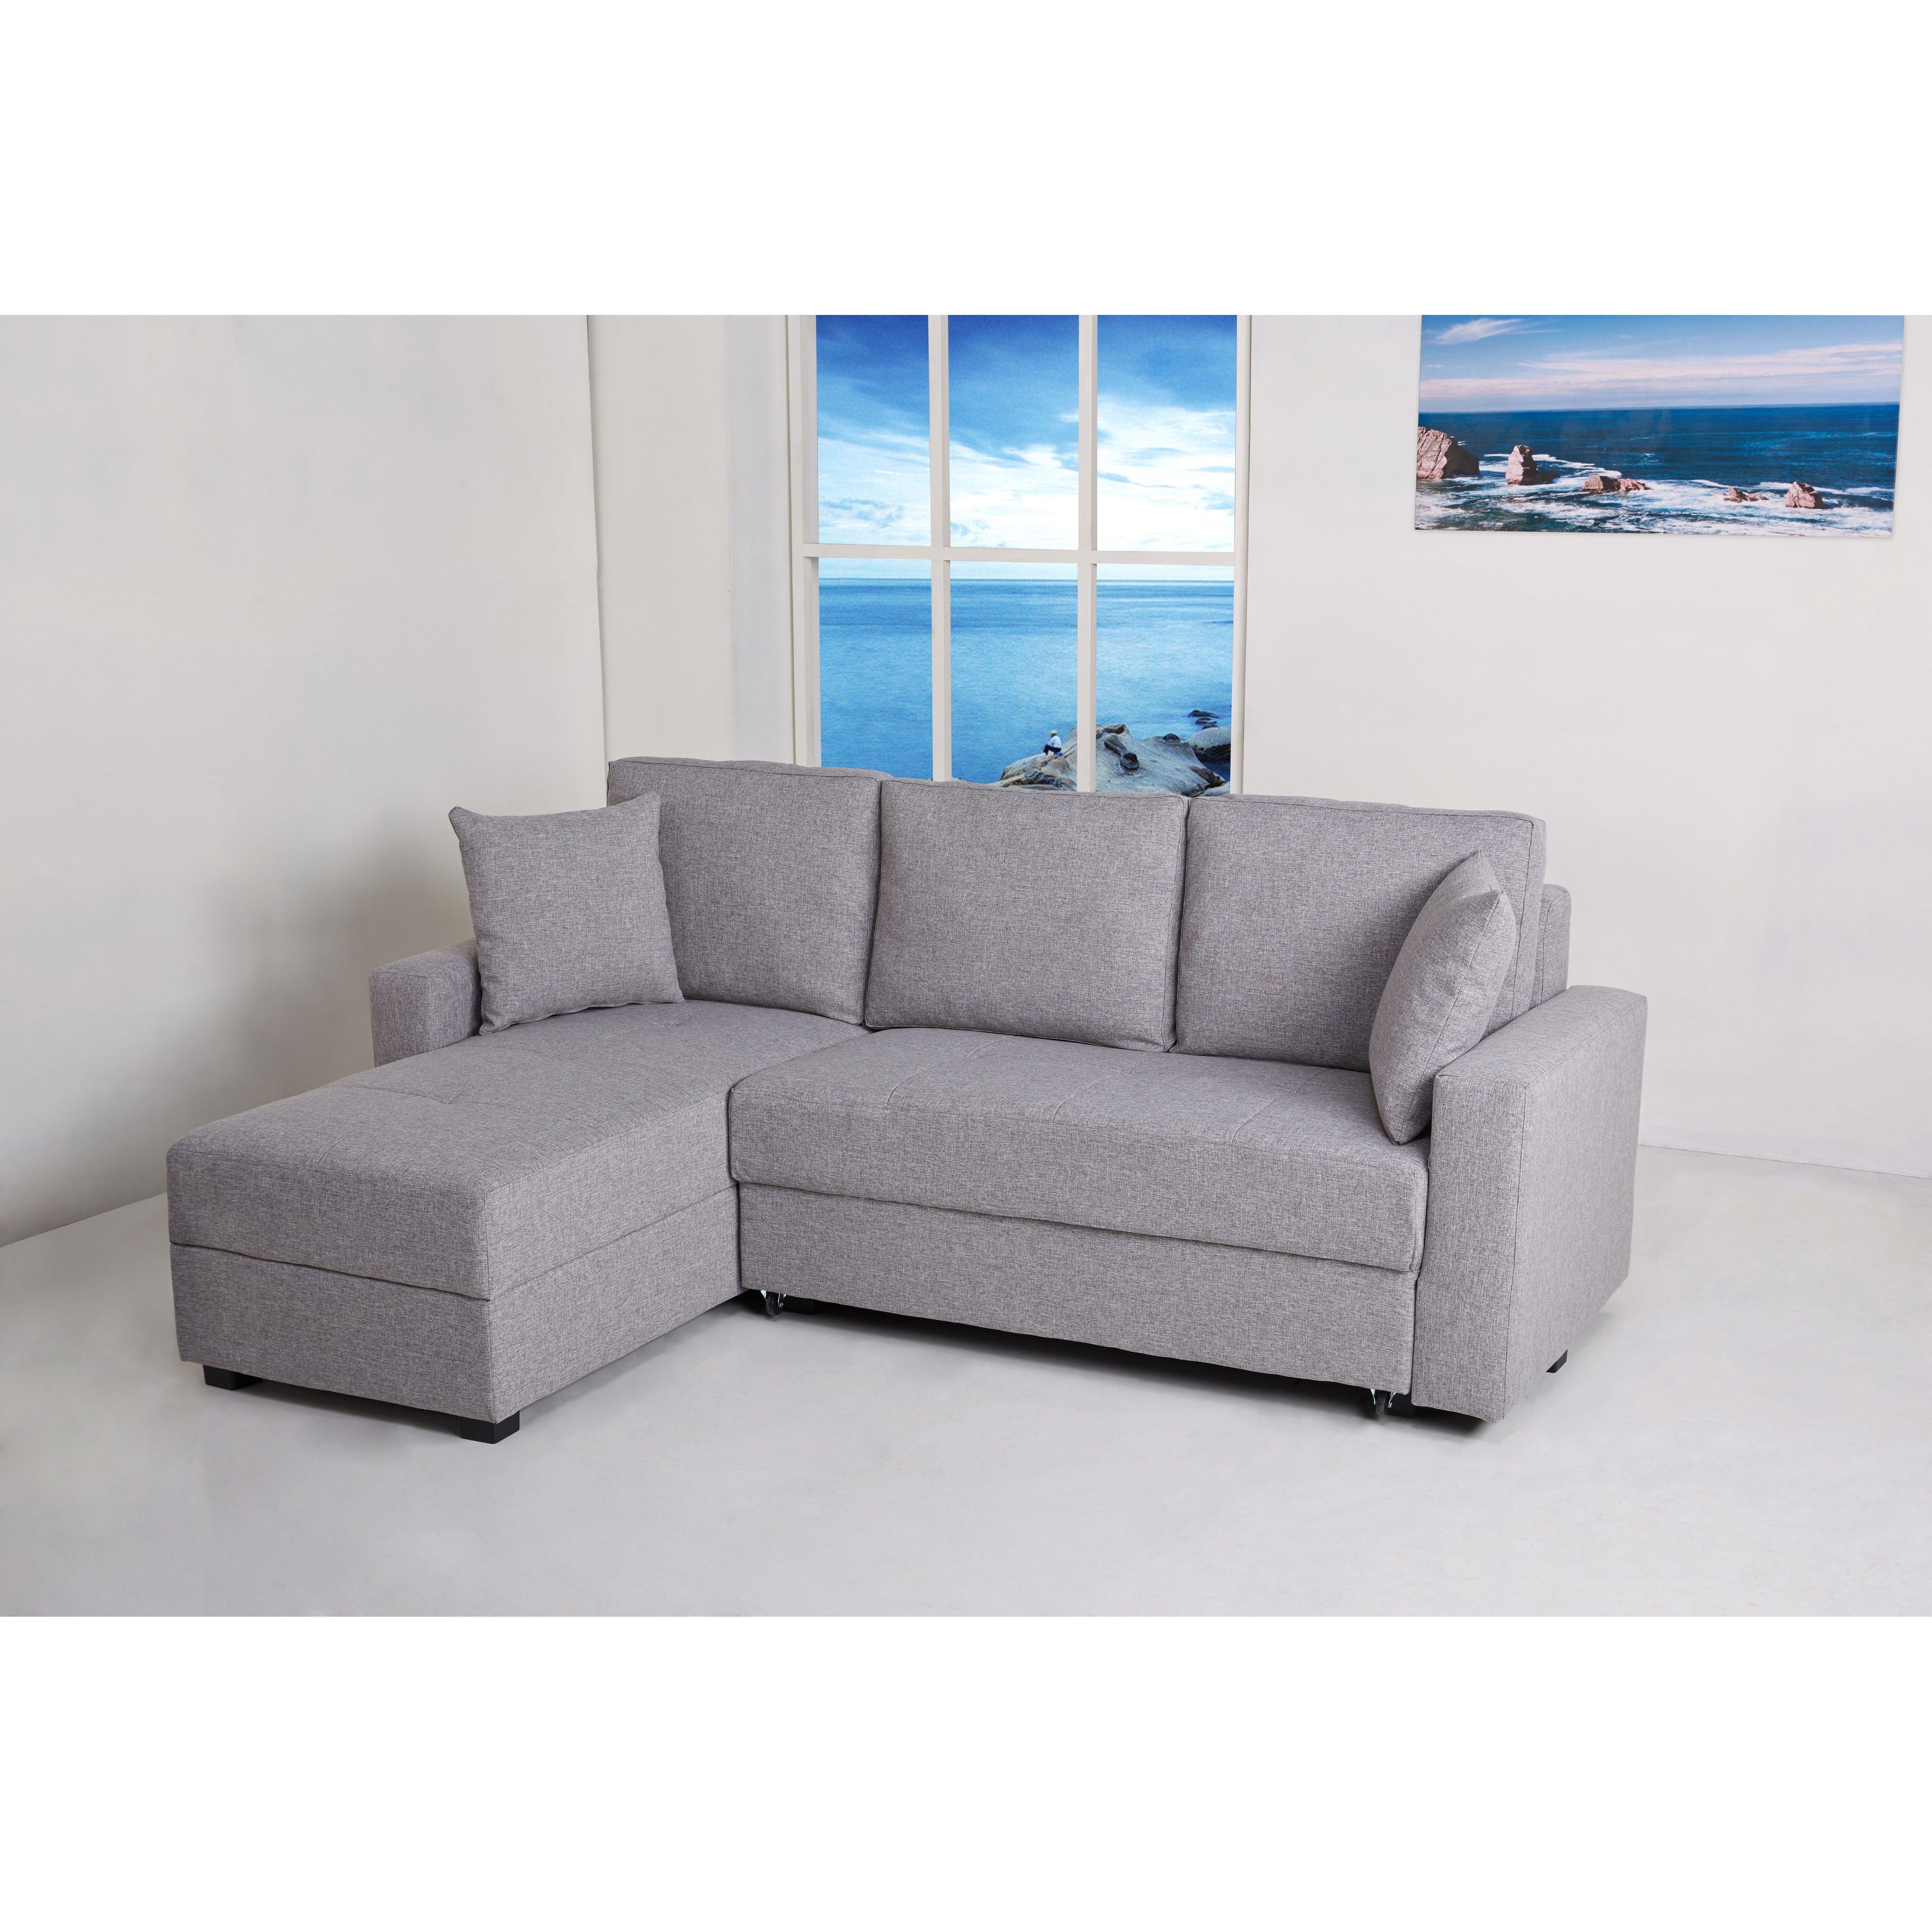 Chaise corner sofa hereo sofa for Chaise corner sofa